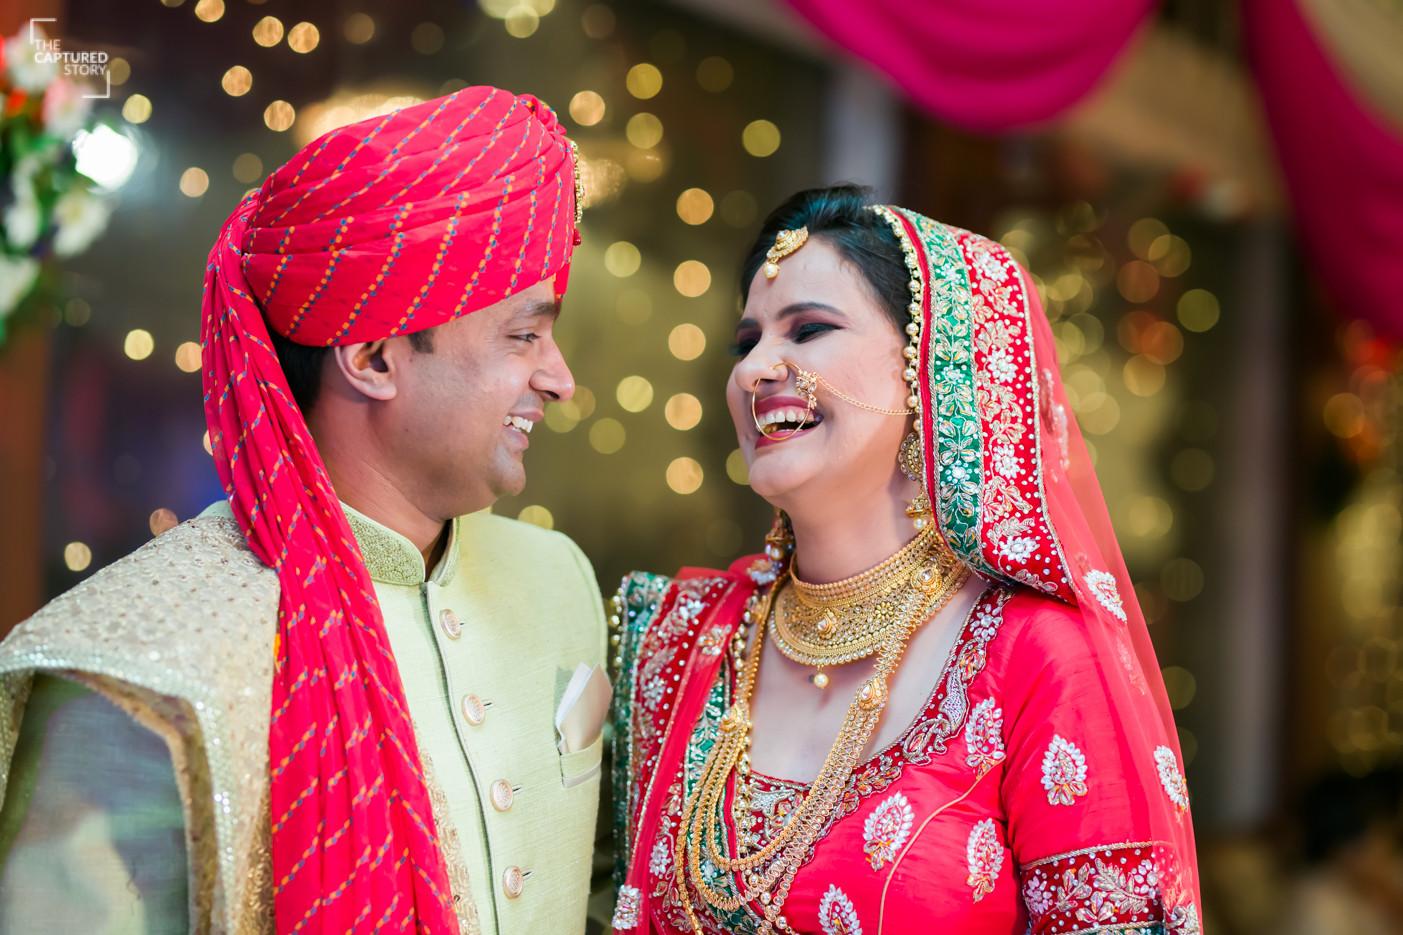 Endearing twain by Captured Memories Wedding-photography | Weddings Photos & Ideas